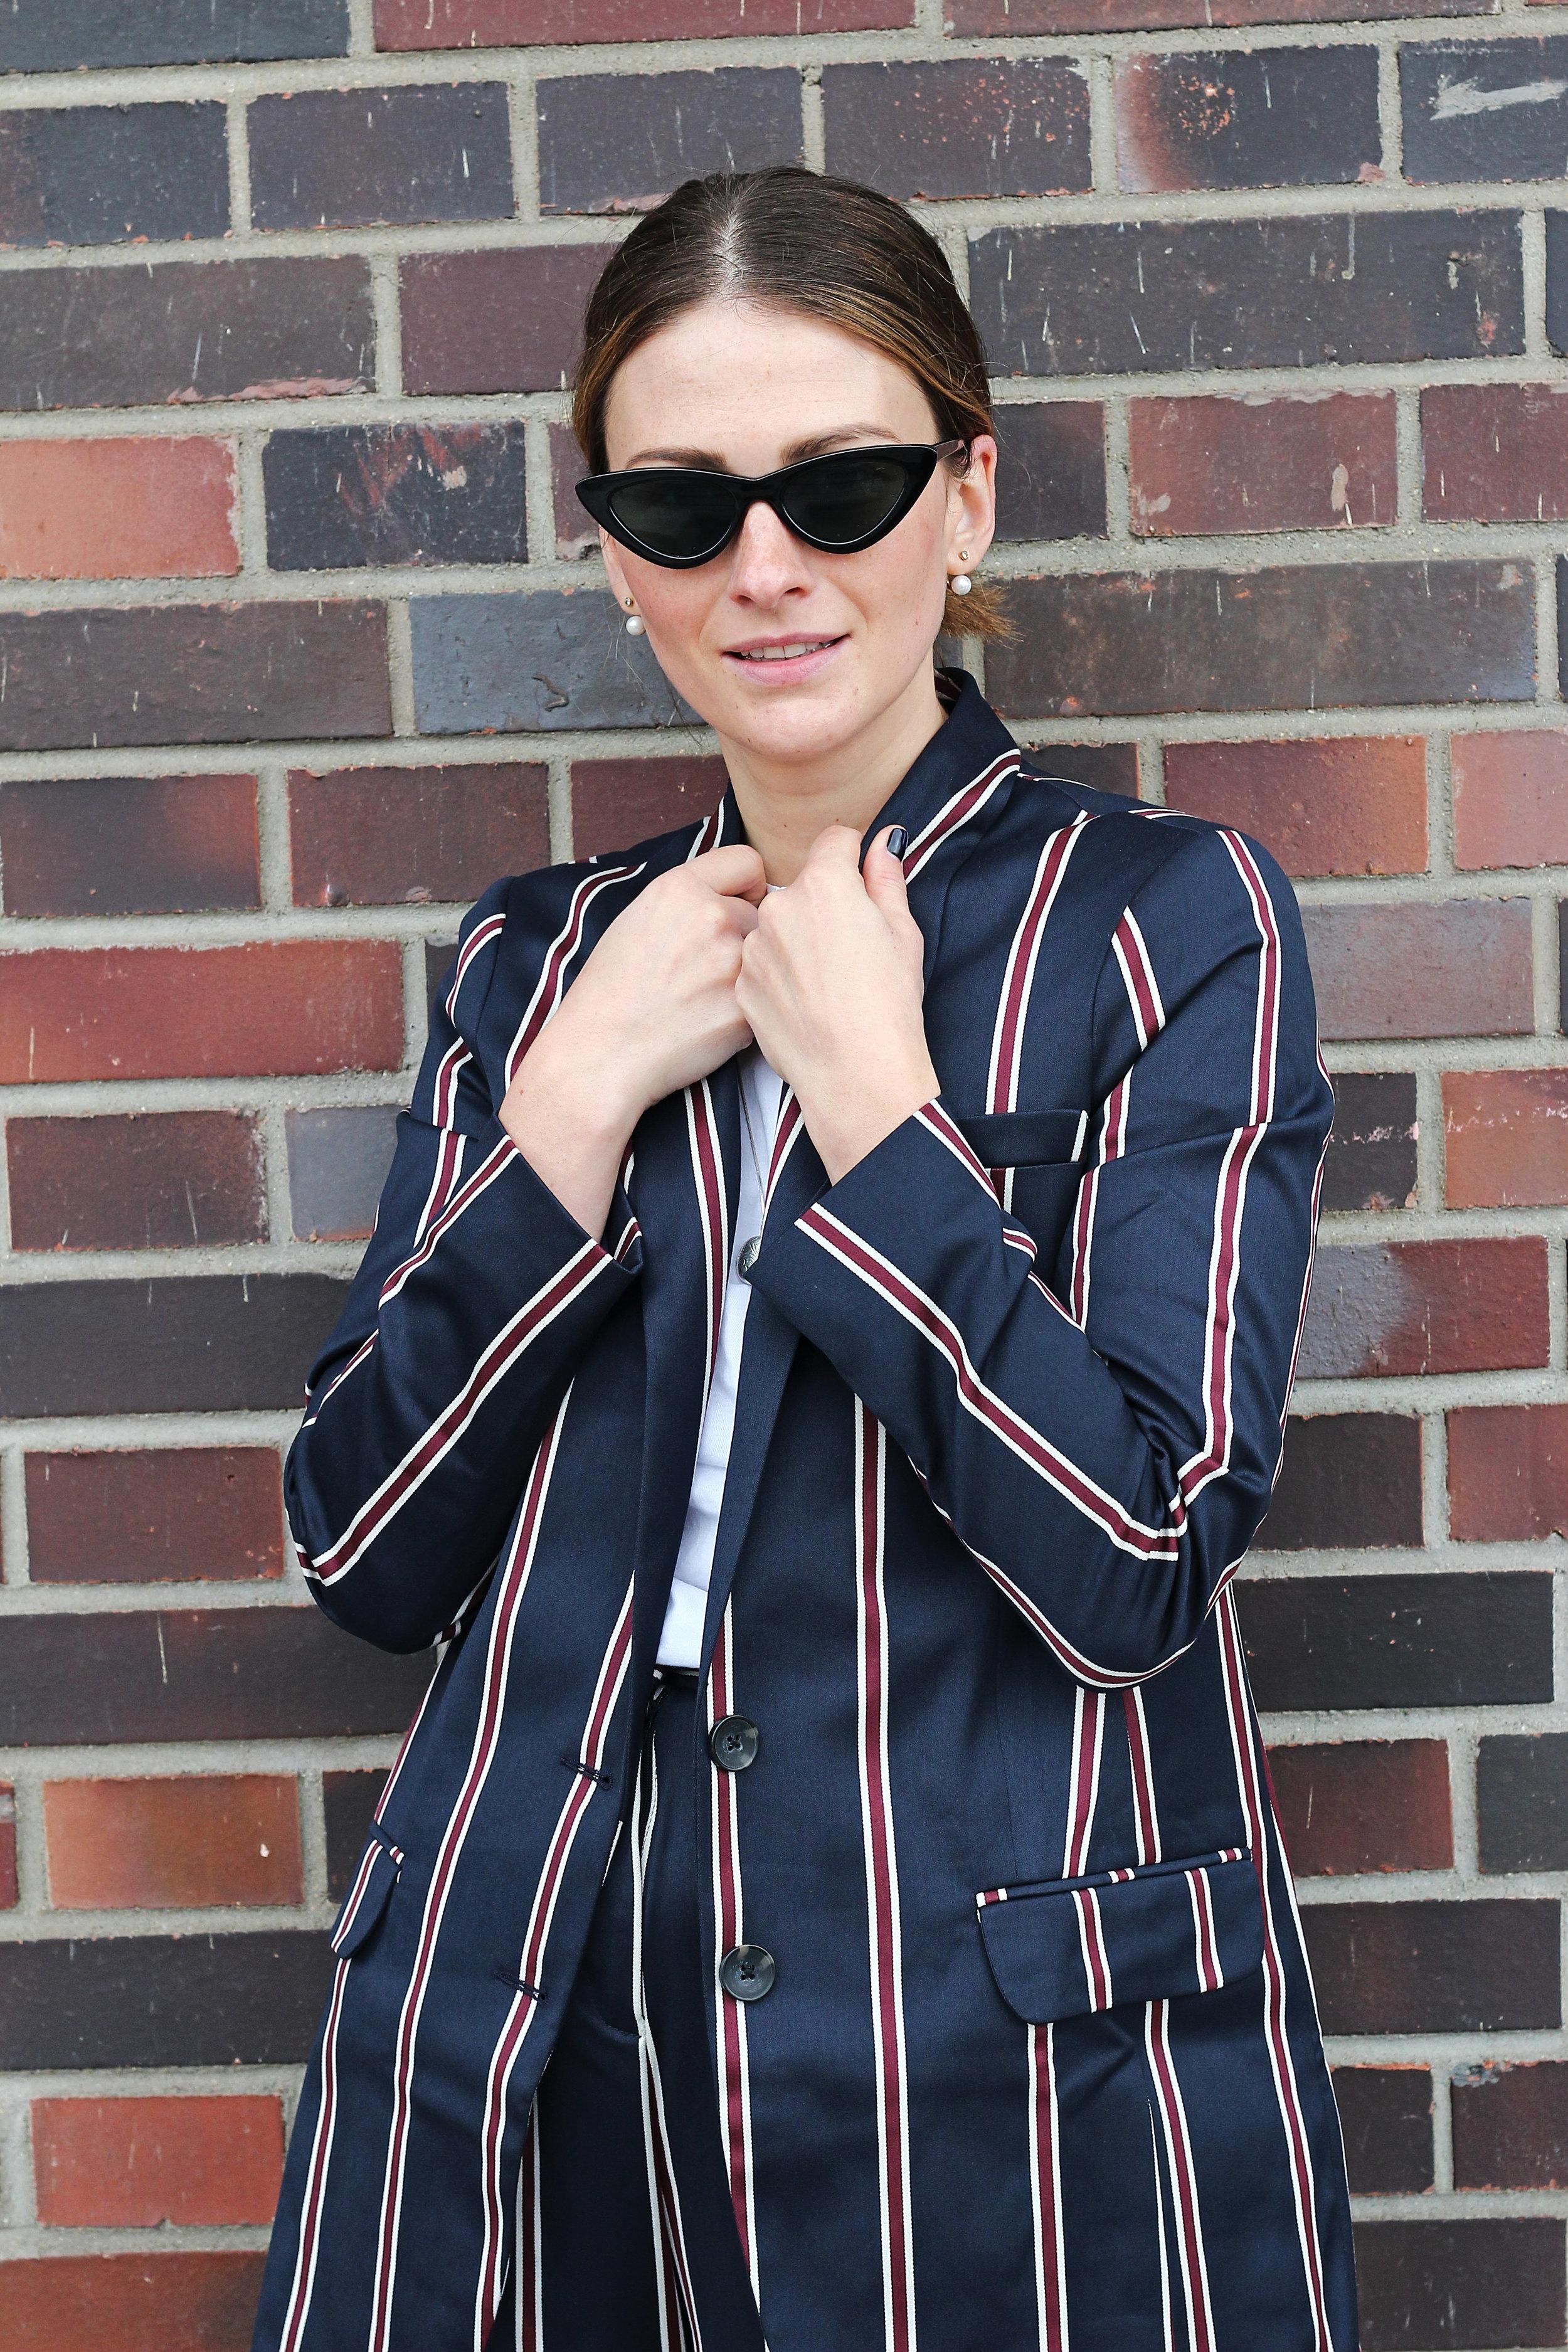 annaporter-striped-suit-asos-casual-look-portrait